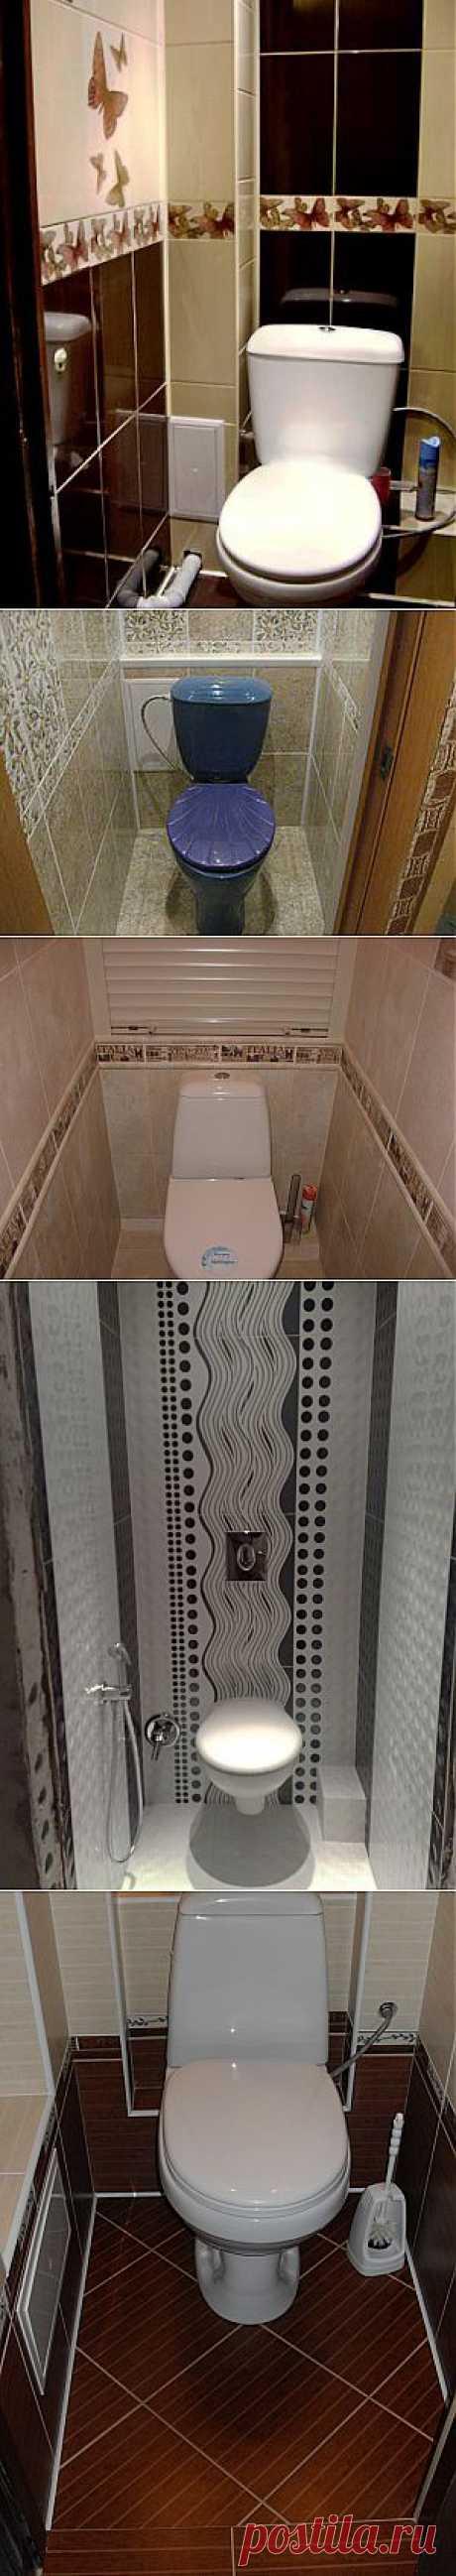 Интерьер маленького туалета (фото)..